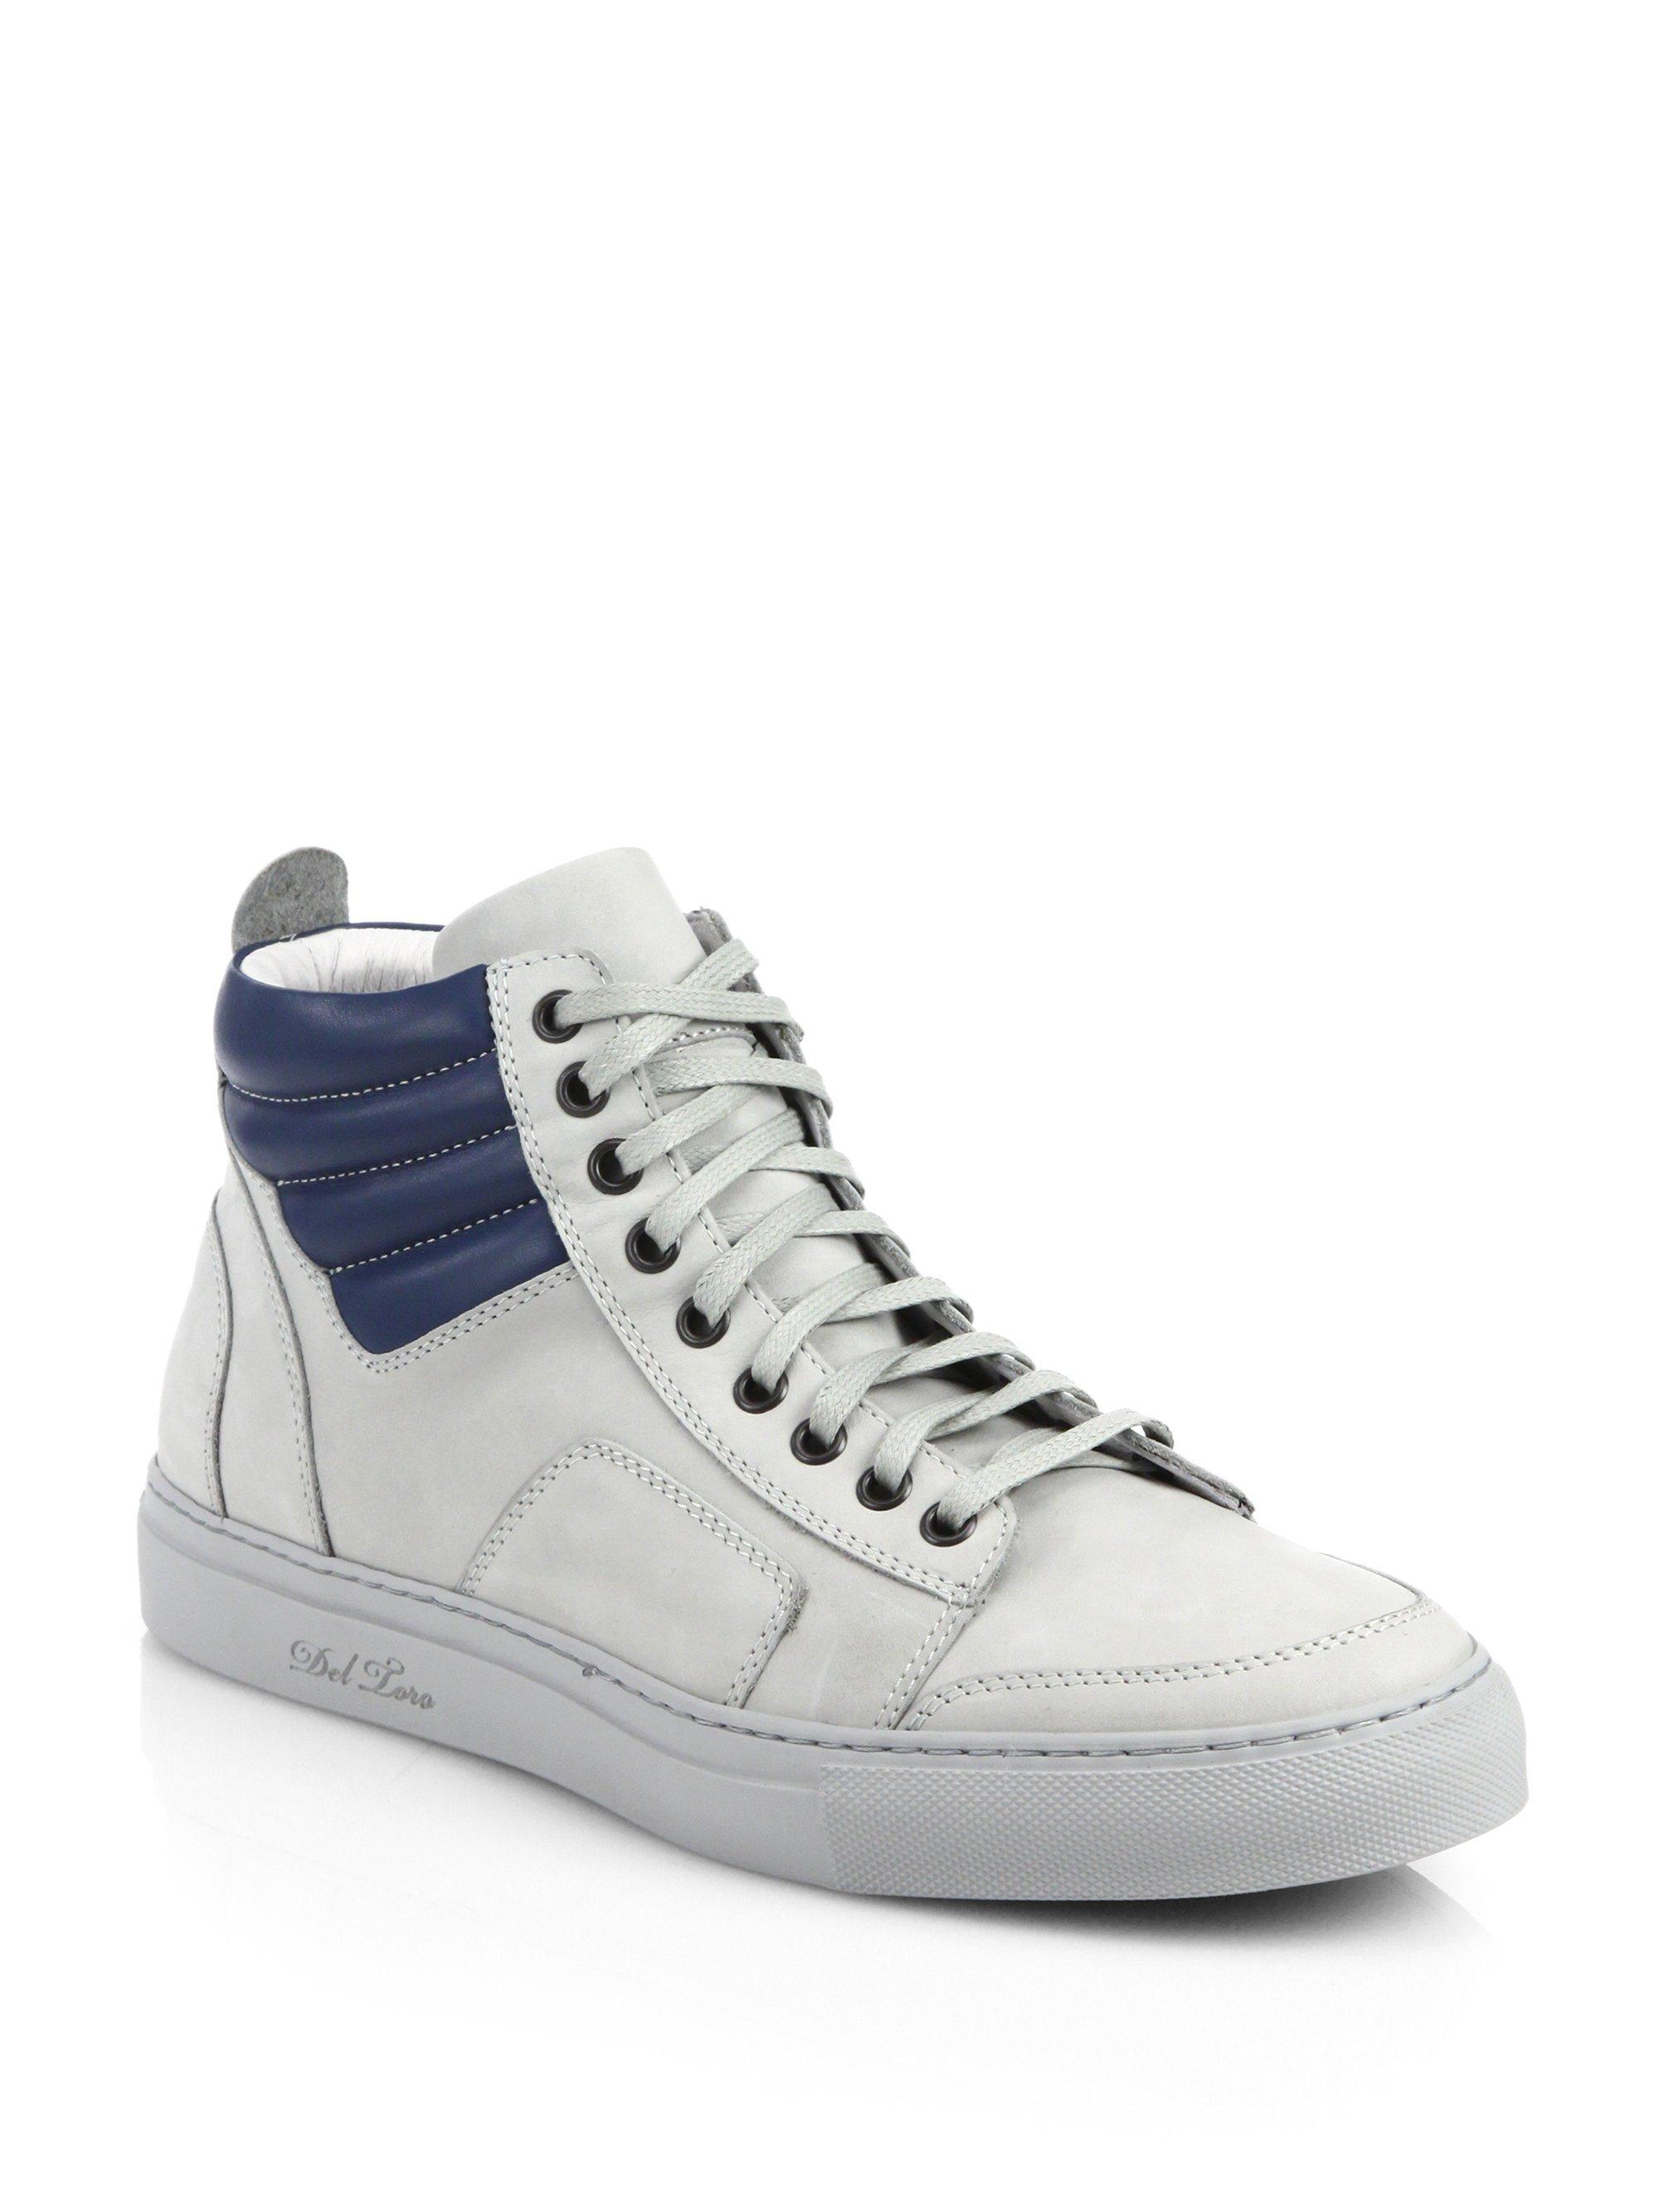 DEL TORO Neon Boxing Sneakers lmplpeVM